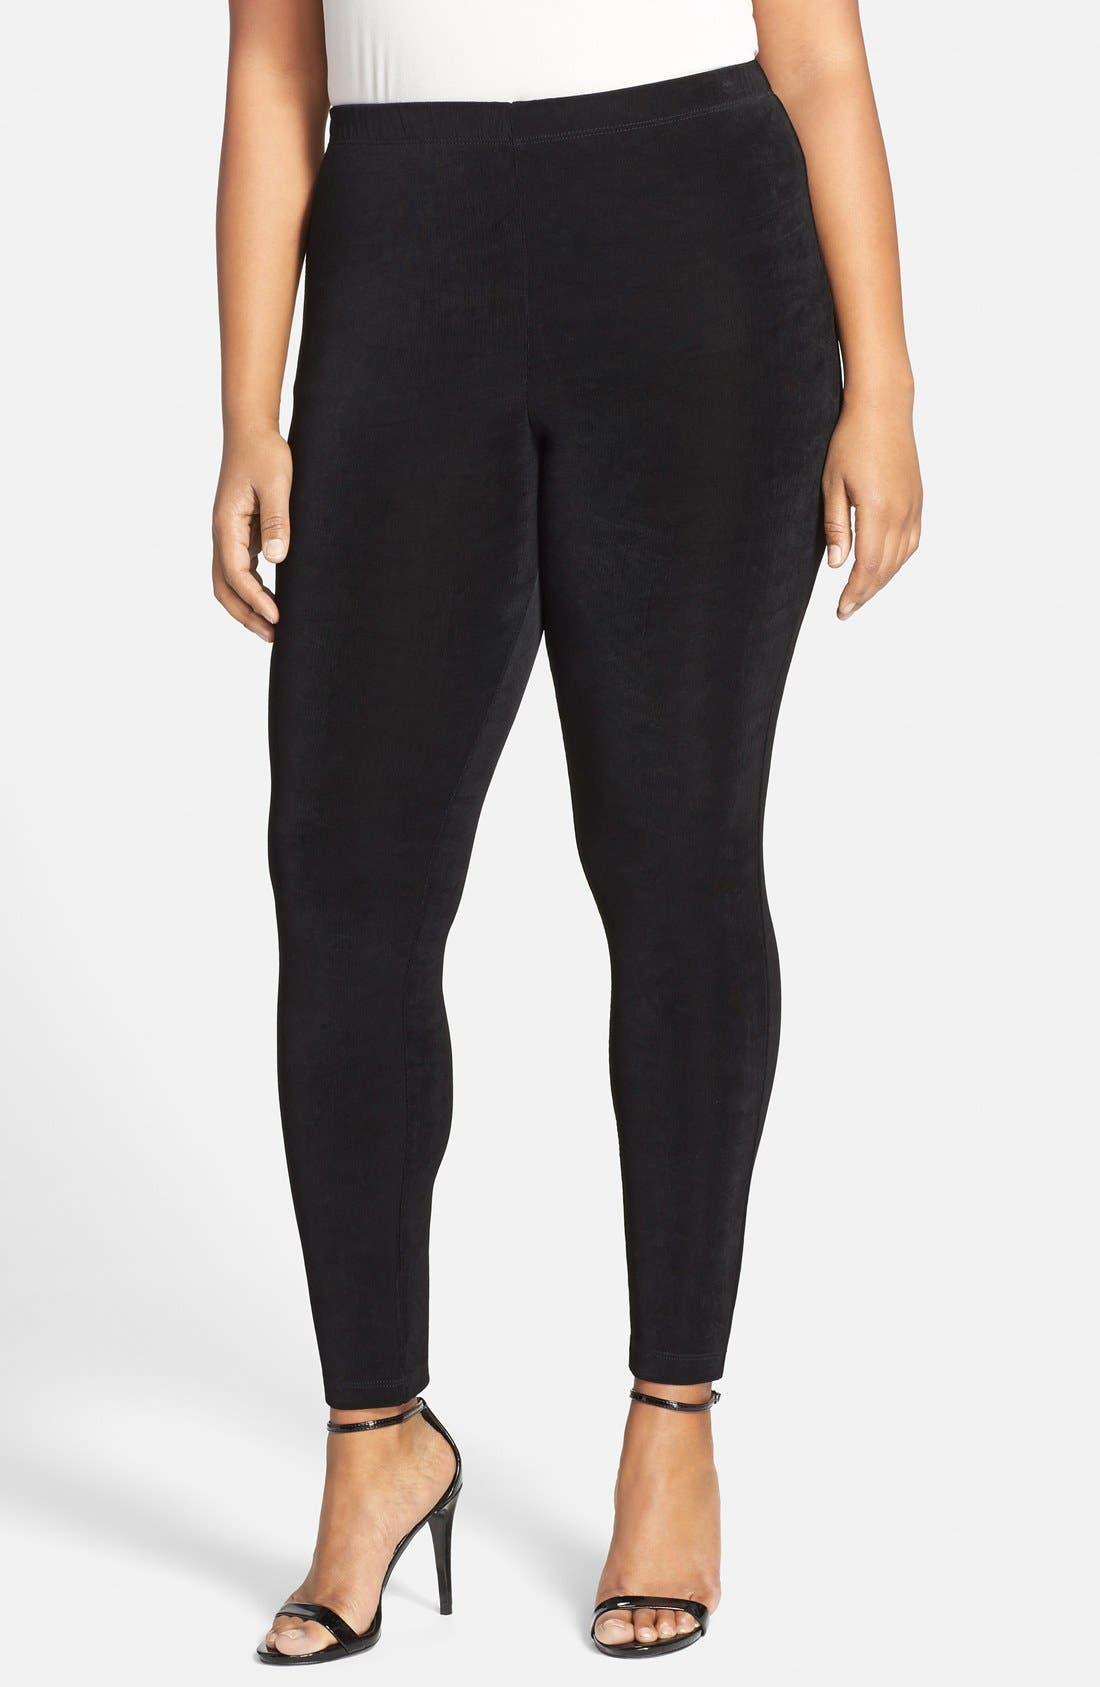 Alternate Image 1 Selected - Vikki Vi Stretch Knit Slim Pants (Plus Size)